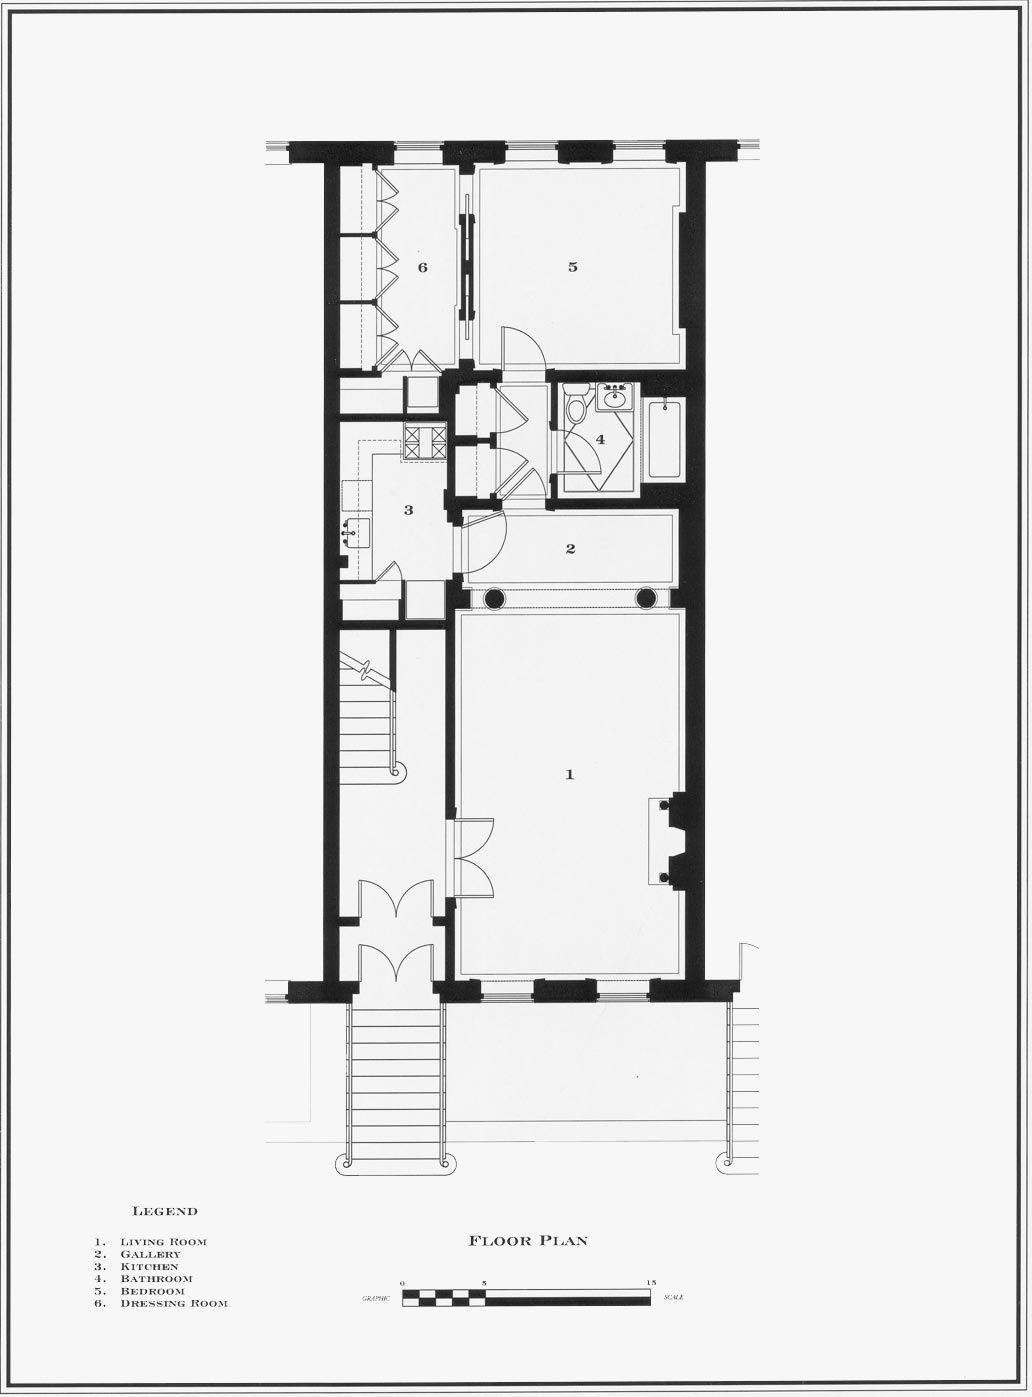 medium resolution of g p schafer architect pllc town house floor plan plan design city living